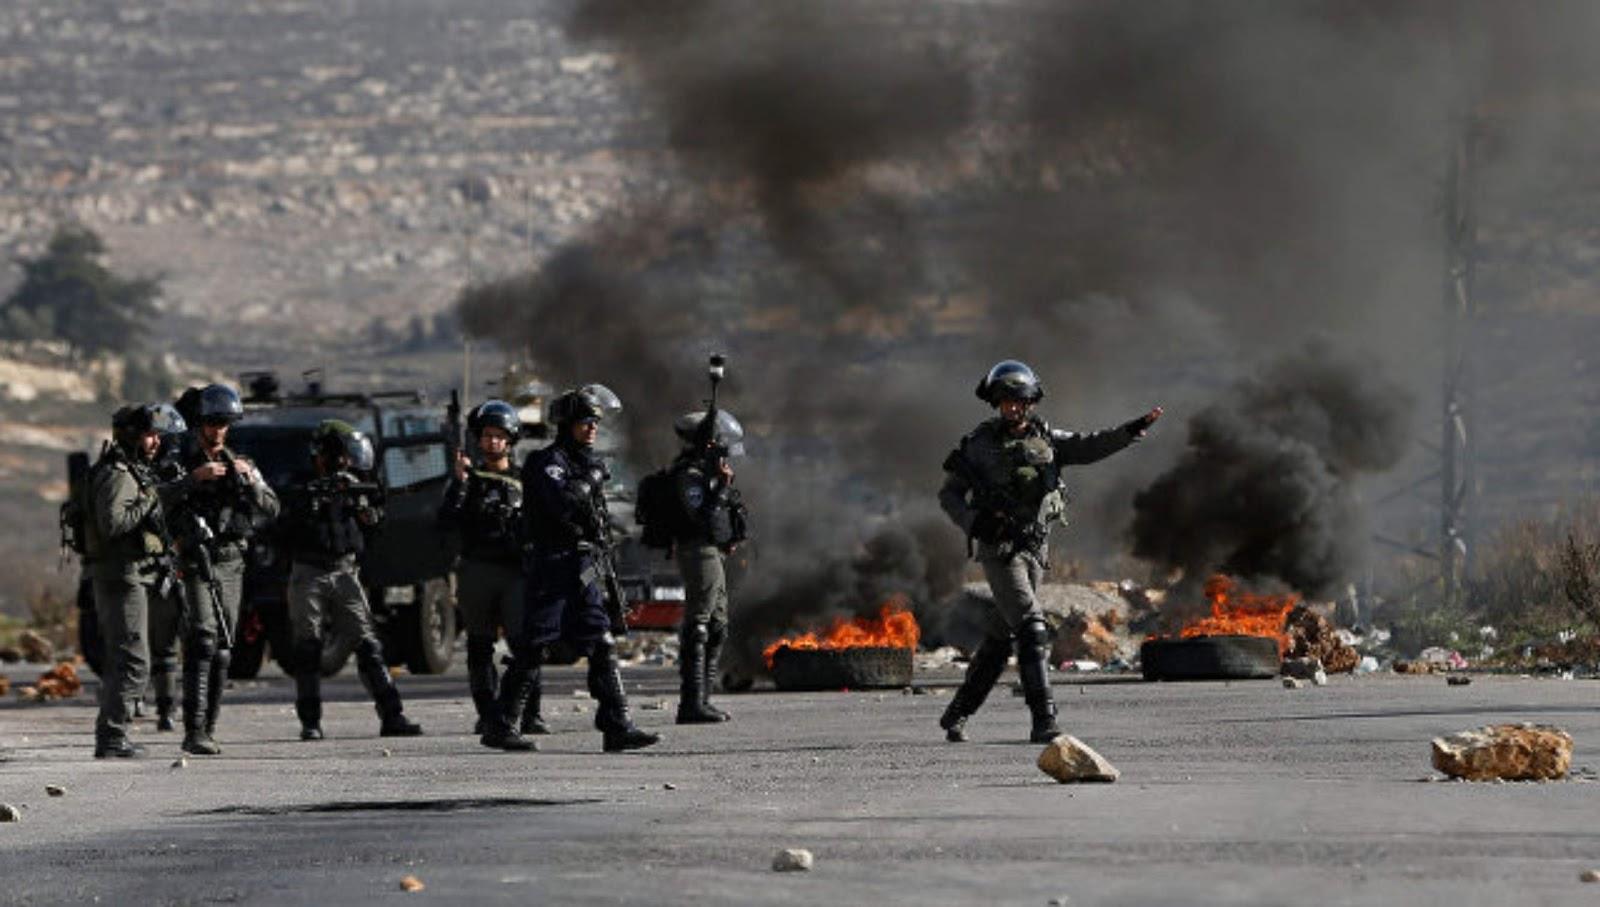 PBB menganggap tindakan tentara Israel terhadap Palestina sebagai kejahatan perang